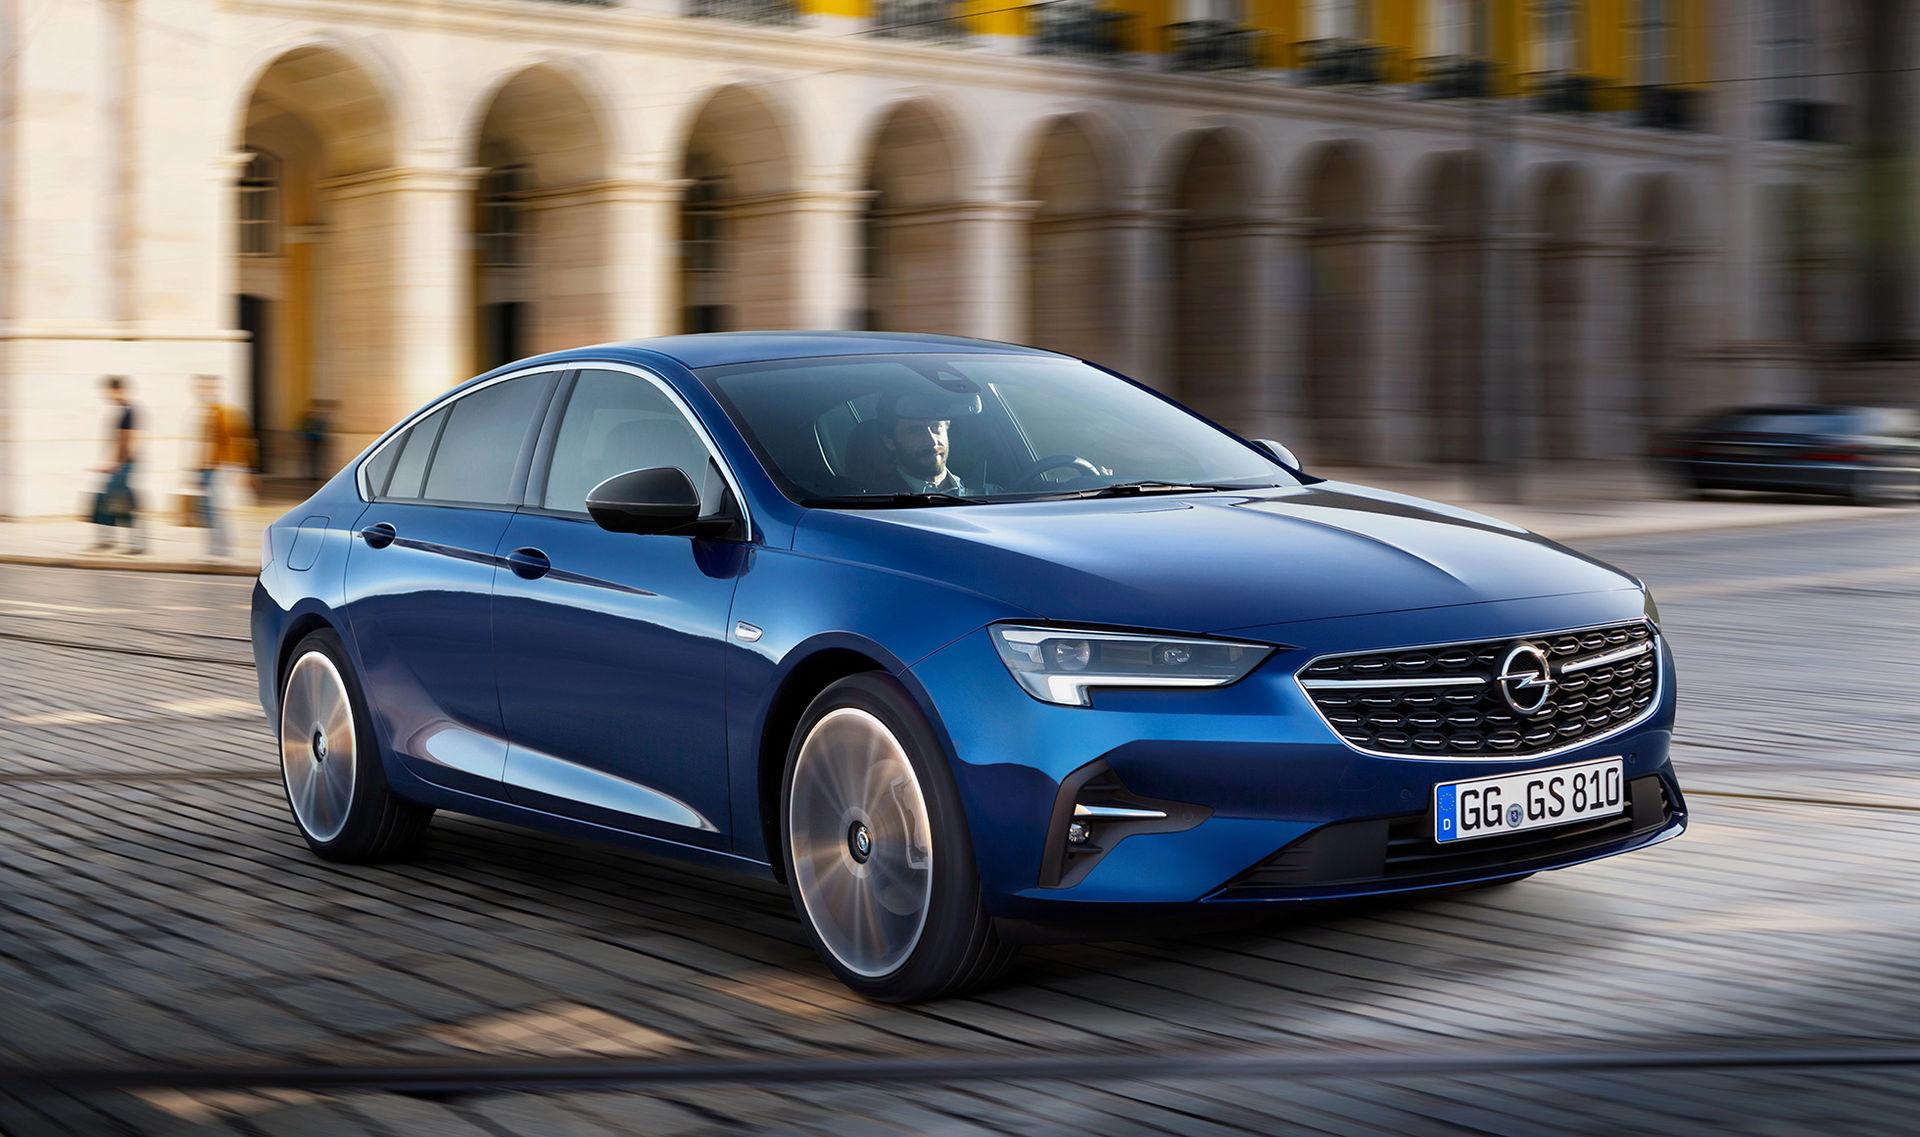 Opel lyfter Insignia